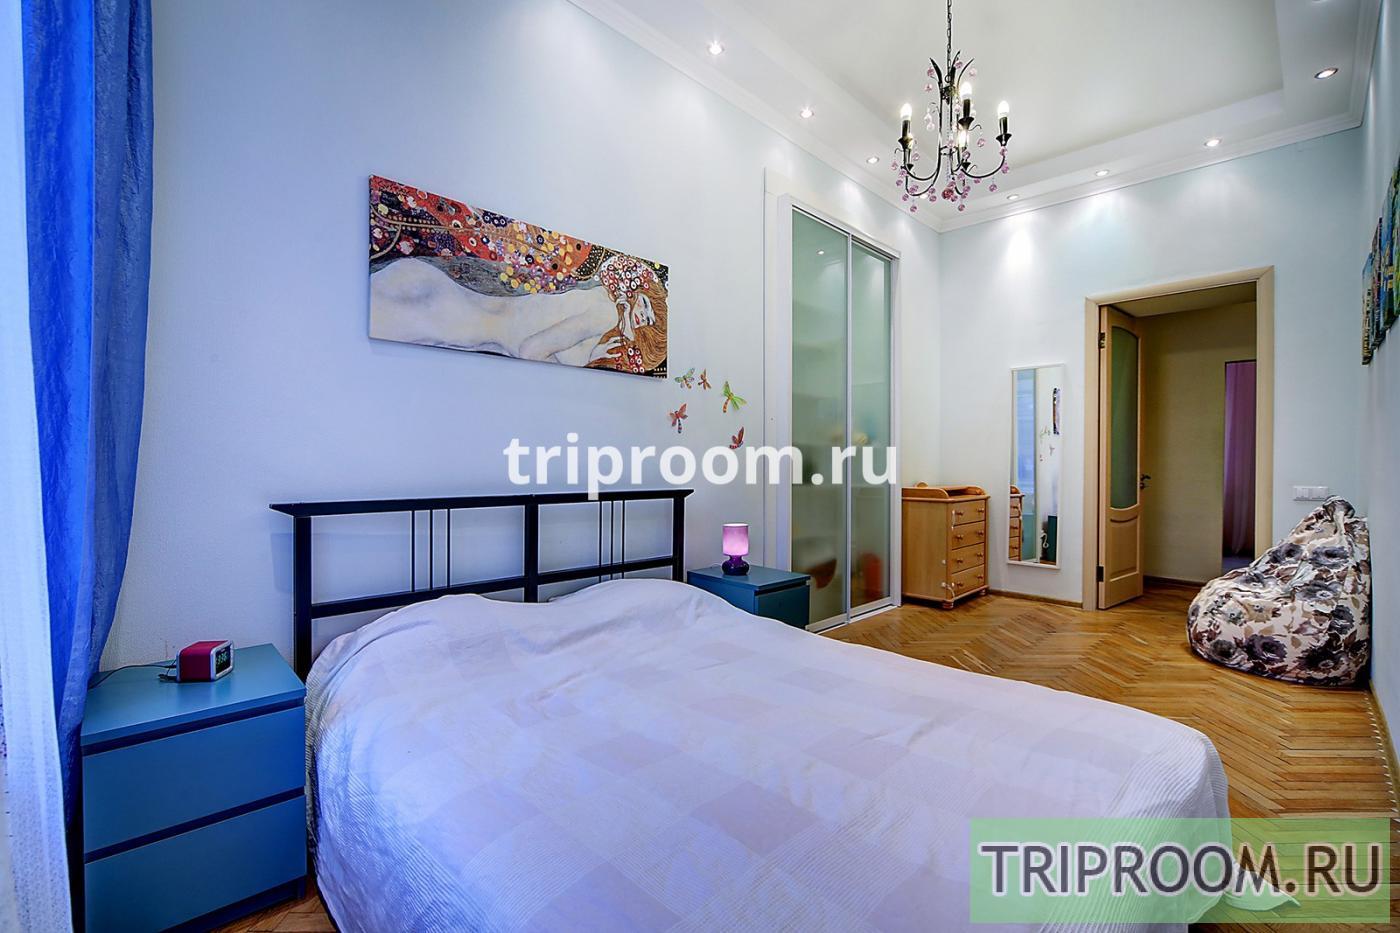 2-комнатная квартира посуточно (вариант № 15426), ул. Лиговский проспект, фото № 16